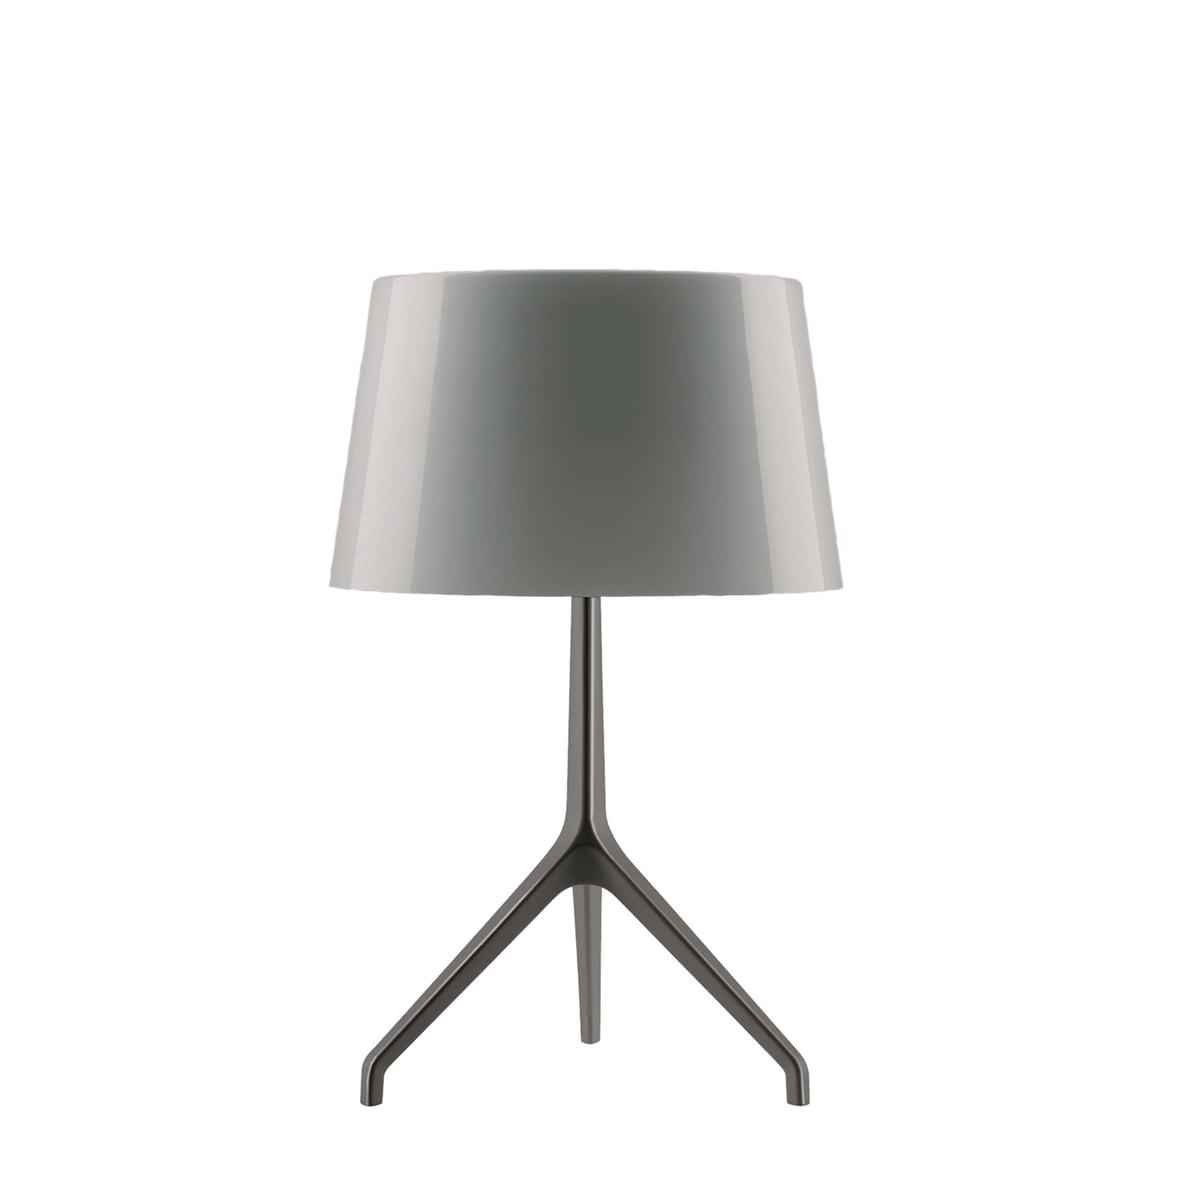 lumiere xxl table lamp by foscarini. Black Bedroom Furniture Sets. Home Design Ideas